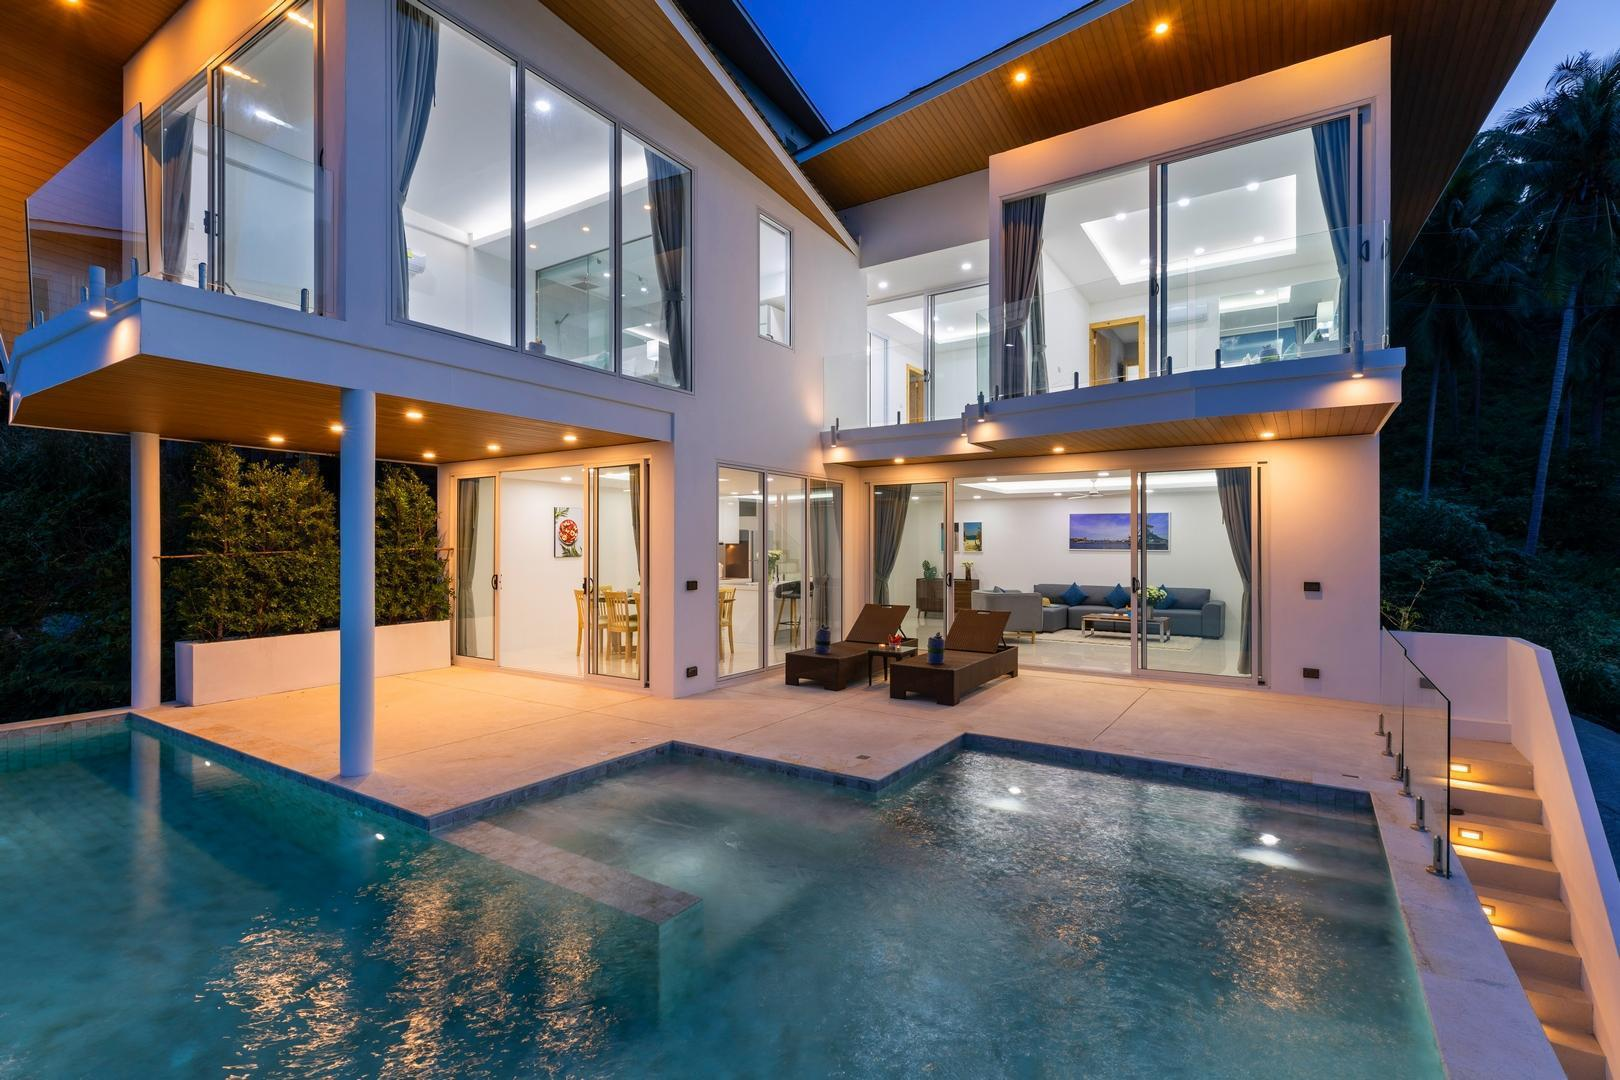 Emerald Villa-4 BR Sea View&Private Pool วิลลา 4 ห้องนอน 4 ห้องน้ำส่วนตัว ขนาด 380 ตร.ม. – เฉวงน้อย